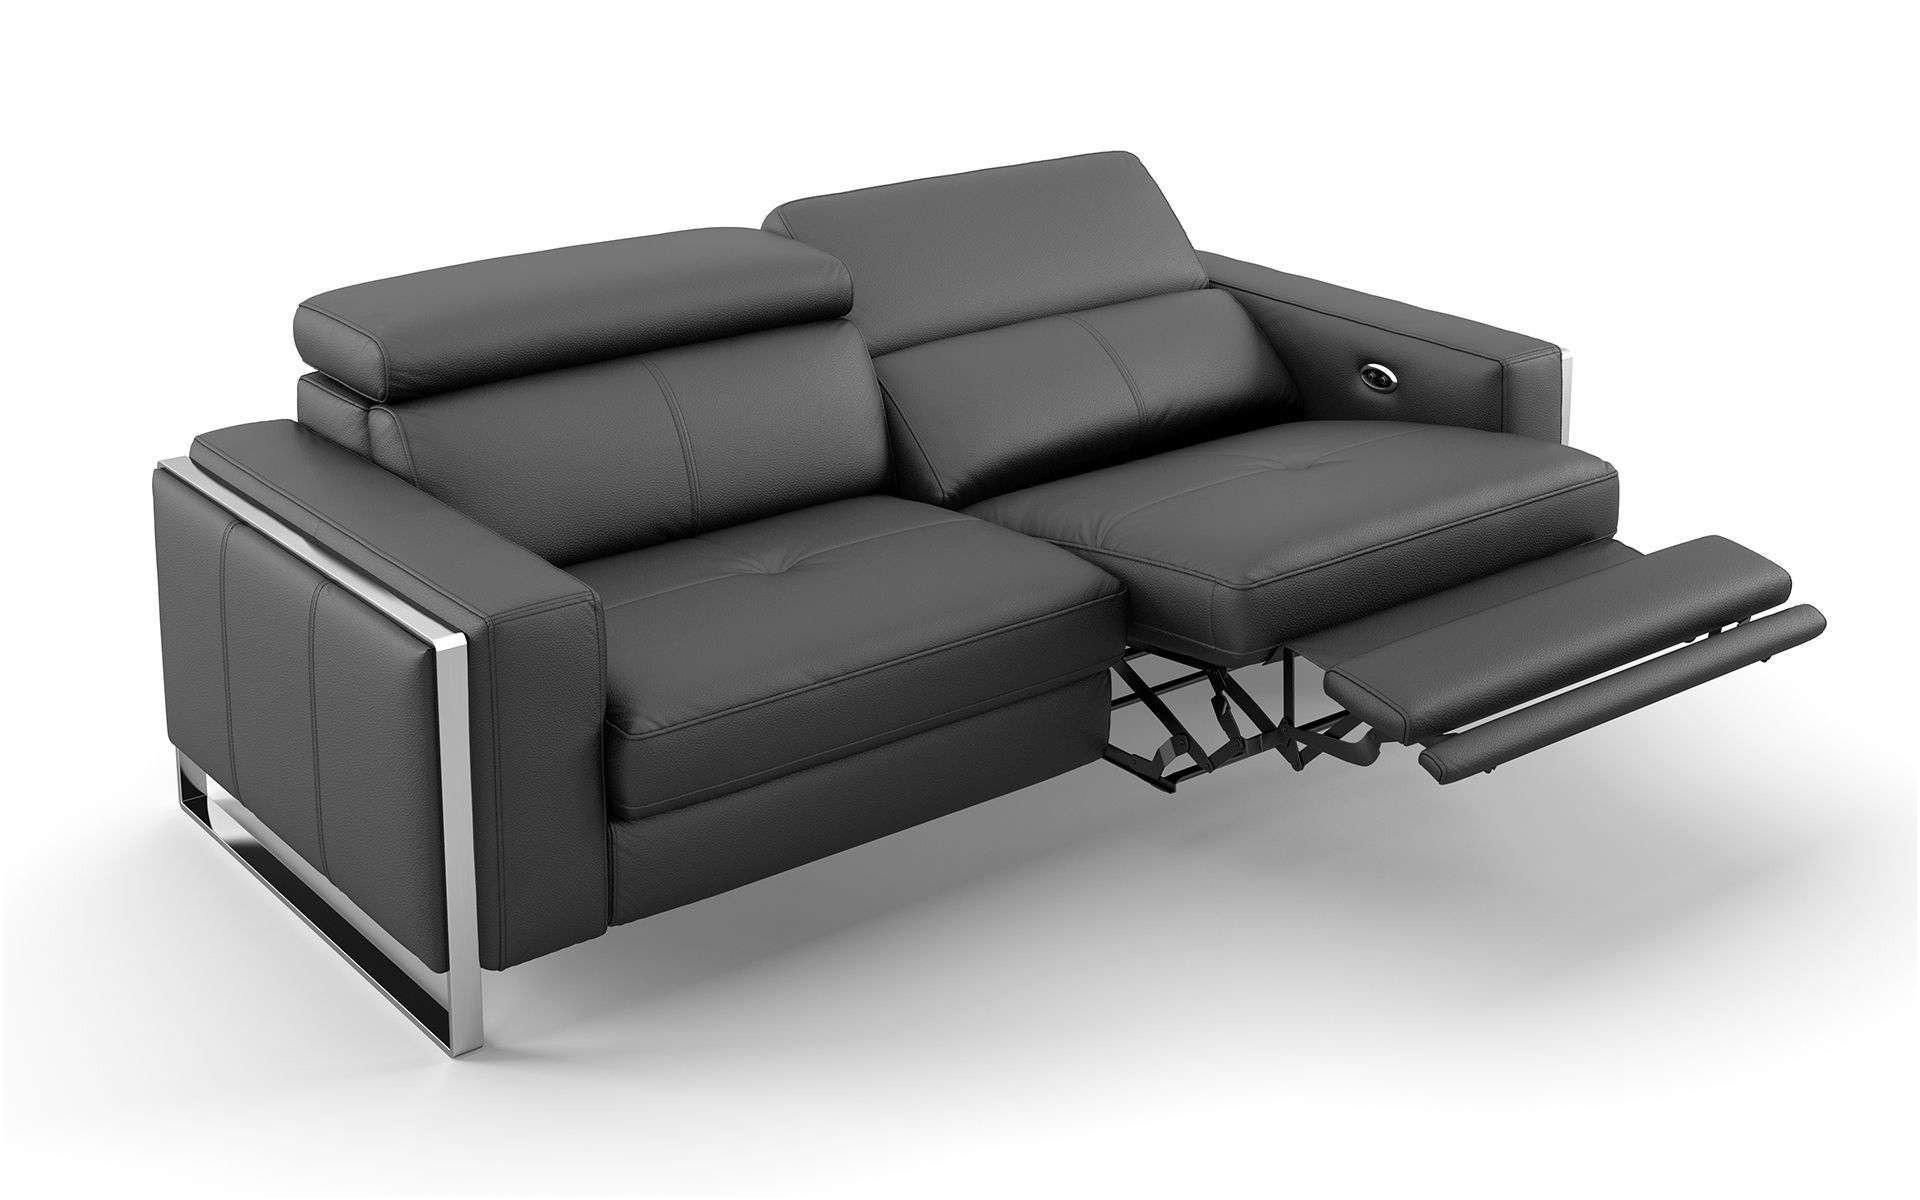 Sofa Mehrzahl  32 Neu Zweisitzer sofa Einzeln Ausziehbar Foto Mehrzahl